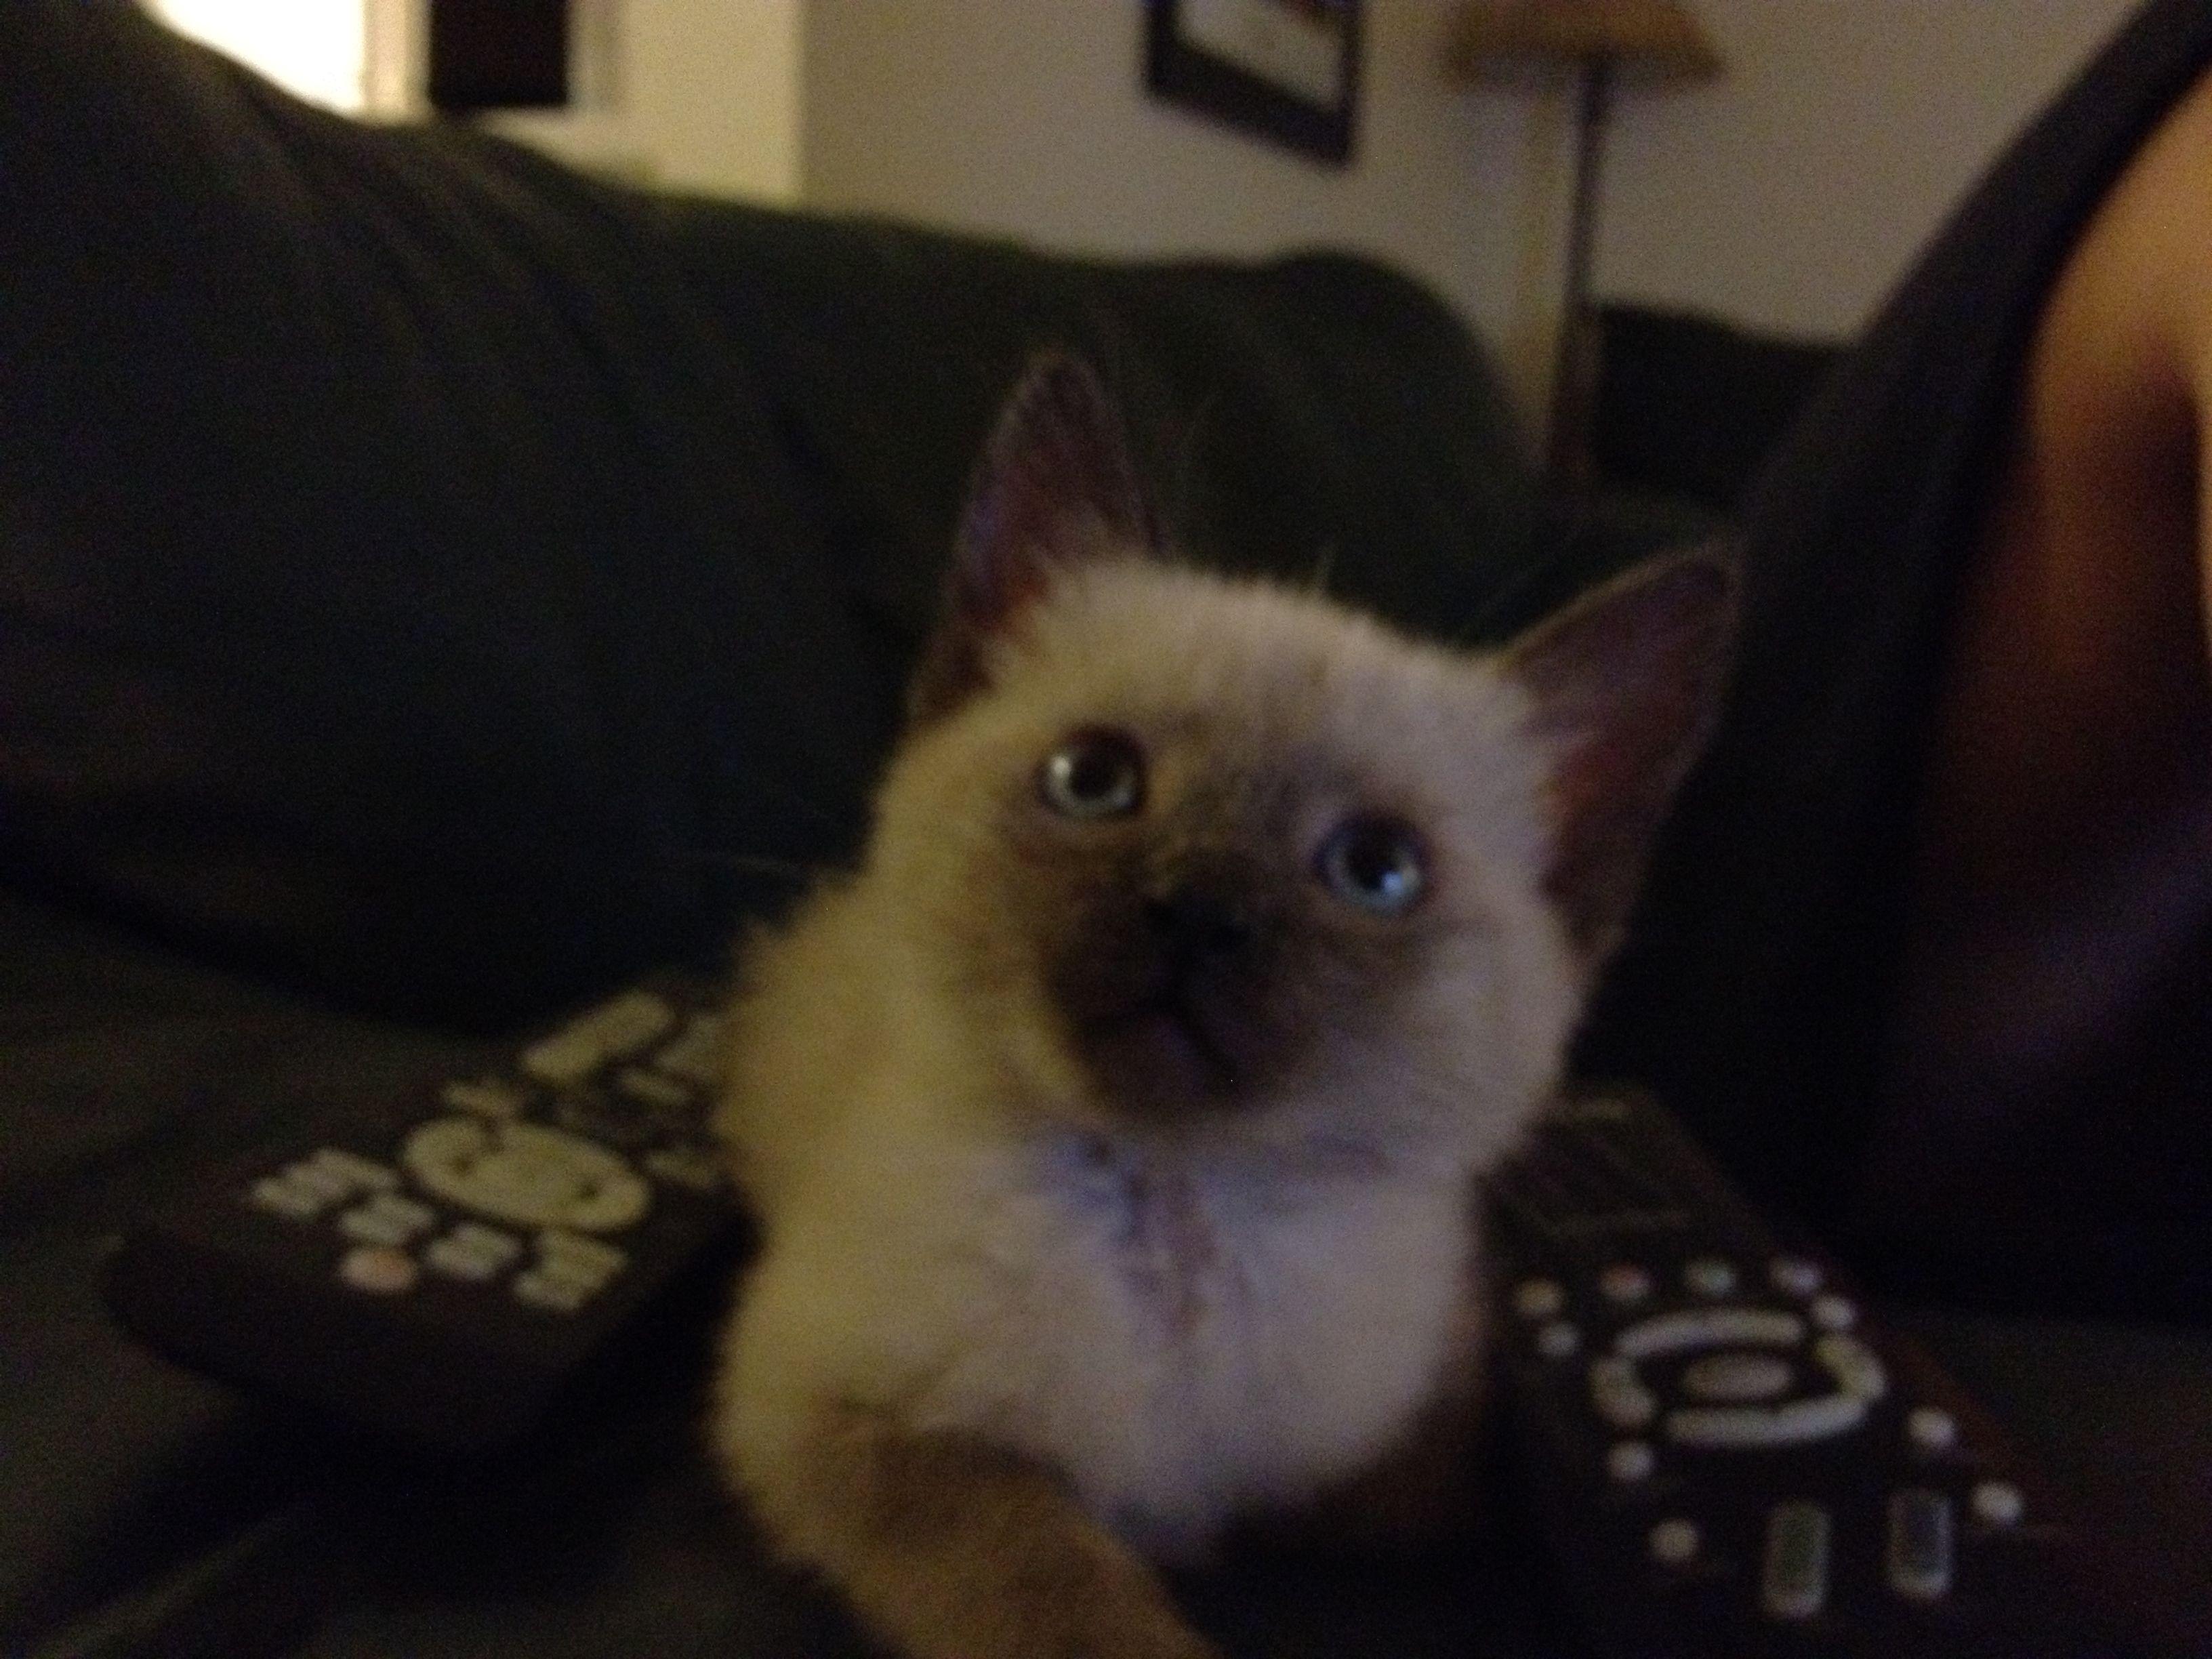 Siamese kitten | Love!!! | Pinterest | Siamese kittens, Siamese ...